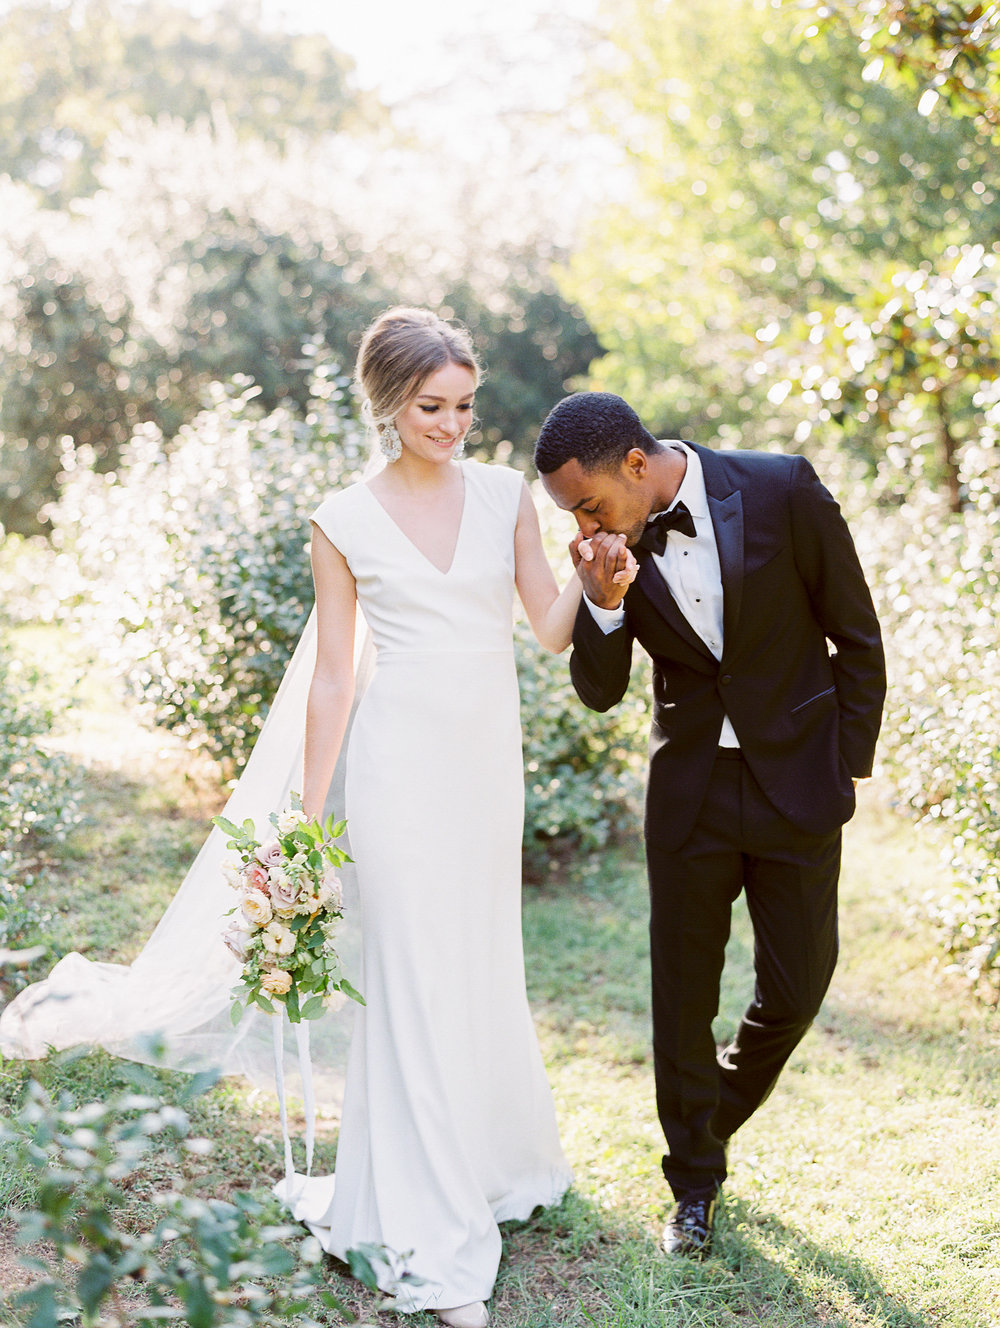 www.hannahforsberg.com-atlanta-wedding-photographer-dunaway-gardens-85.jpg